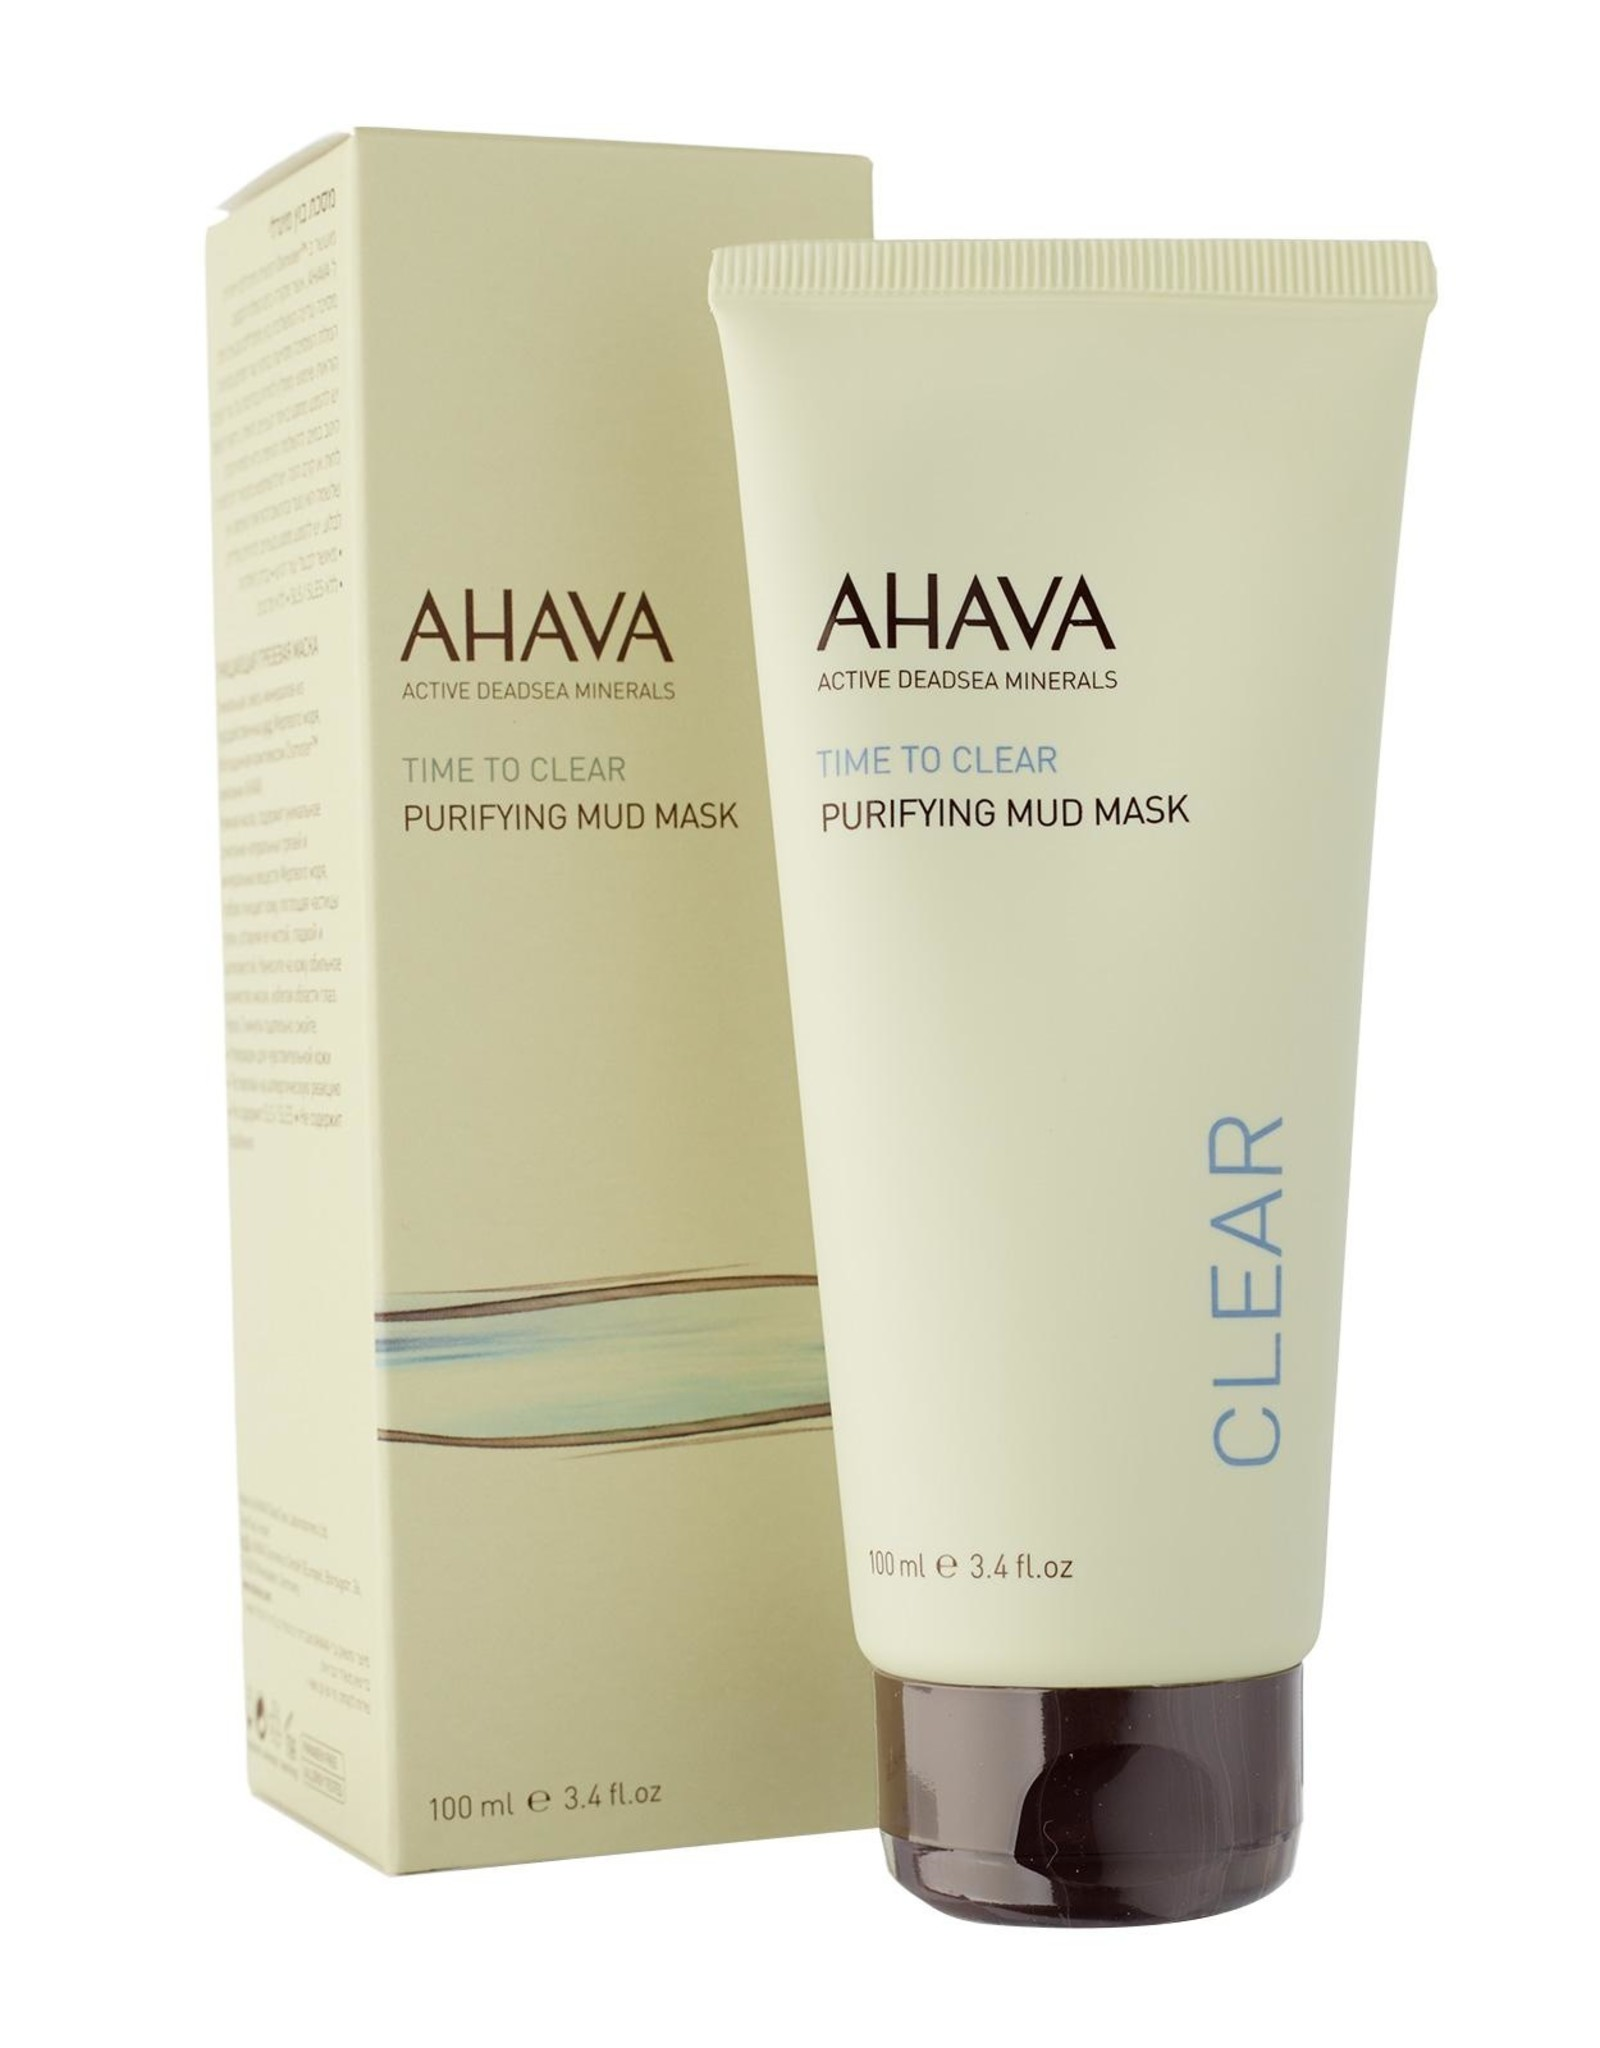 AHAVA purifying mud mask 100ml